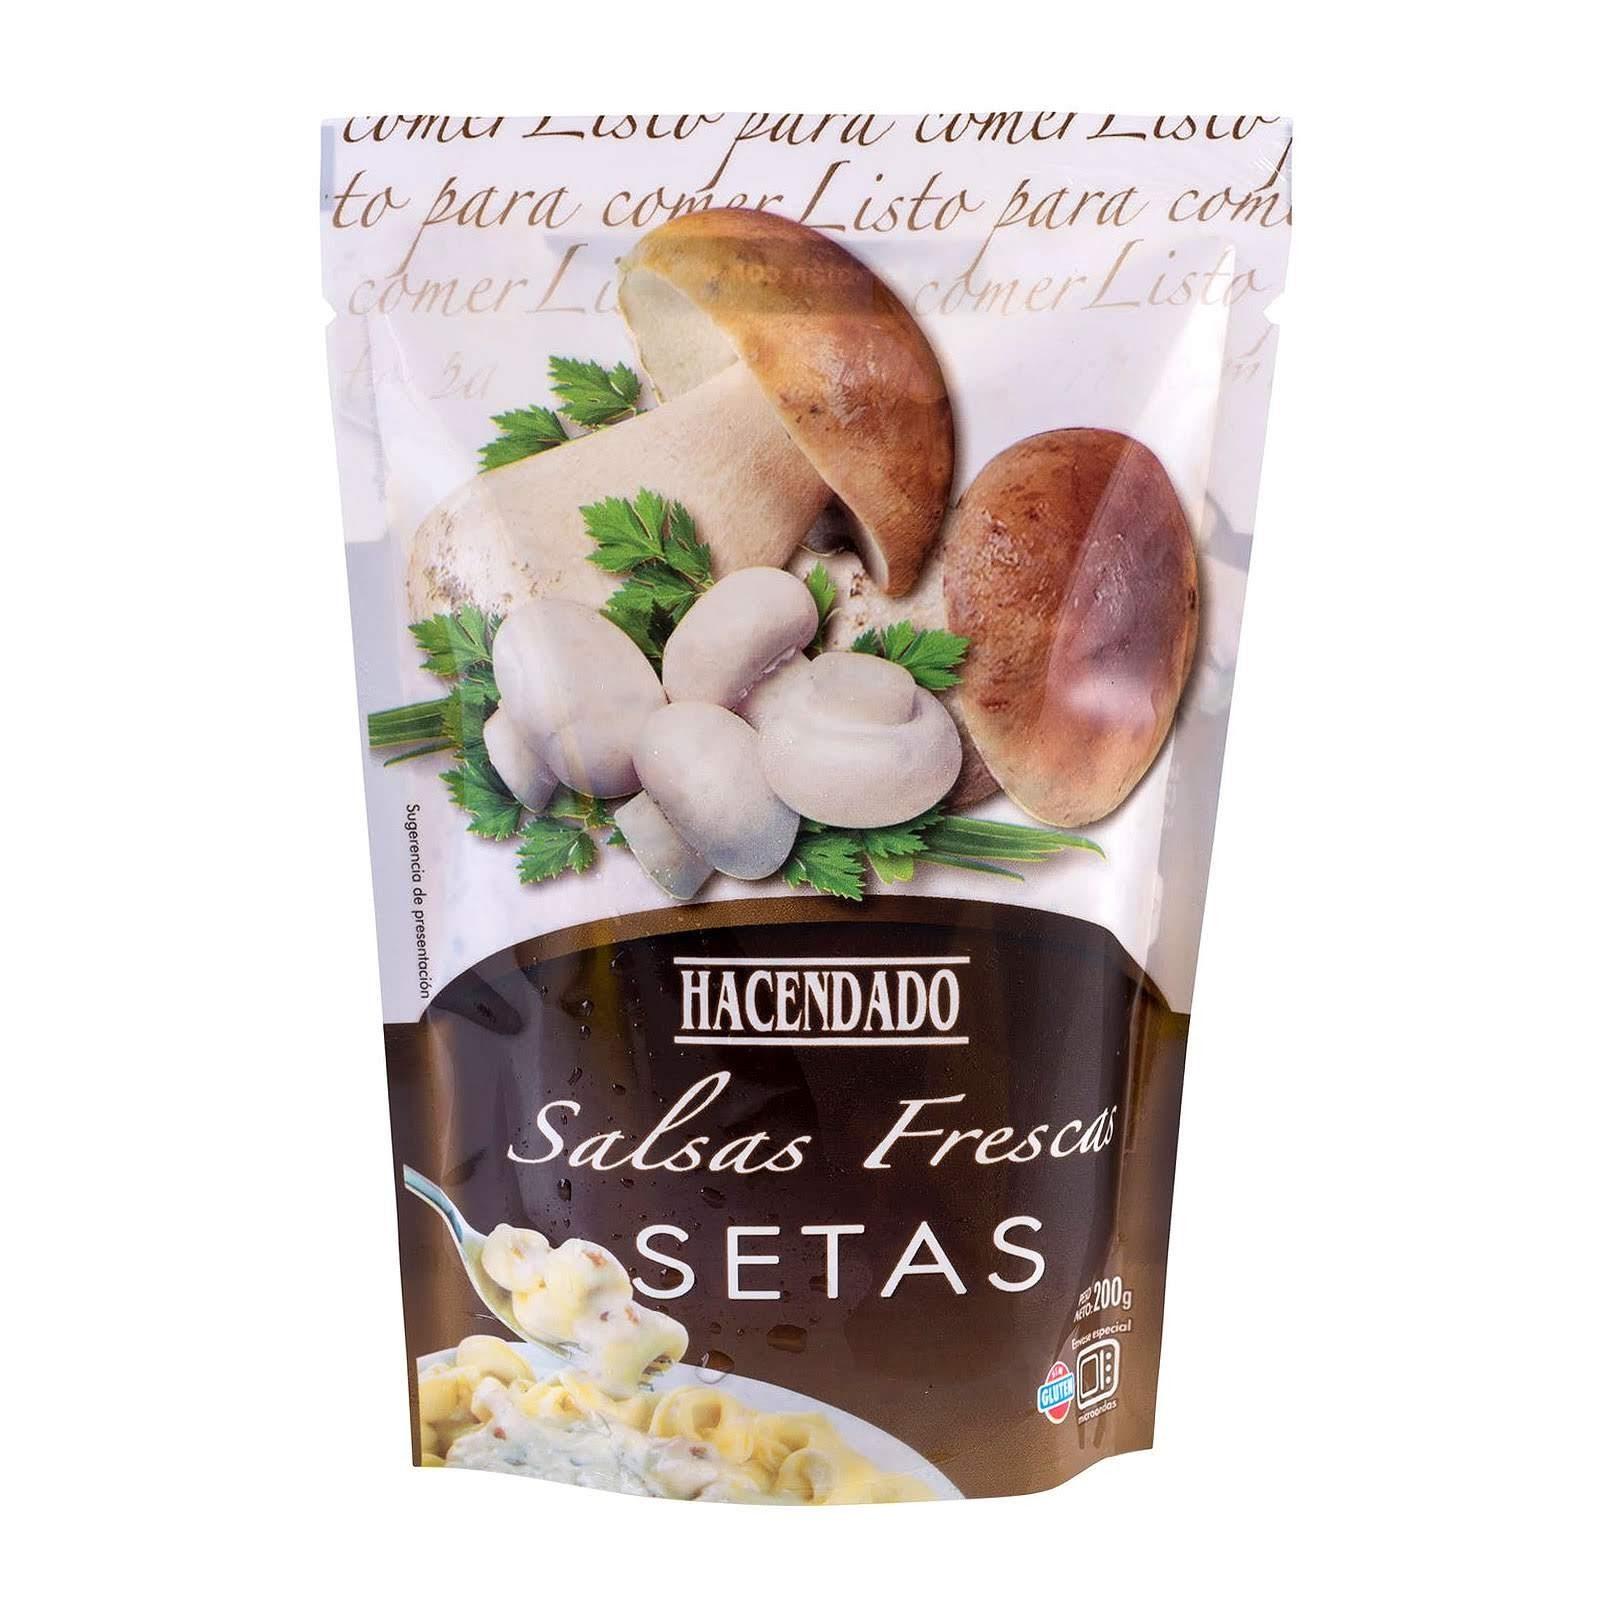 salsa-fresca-setas-hacendado-mercadona-1-5819863